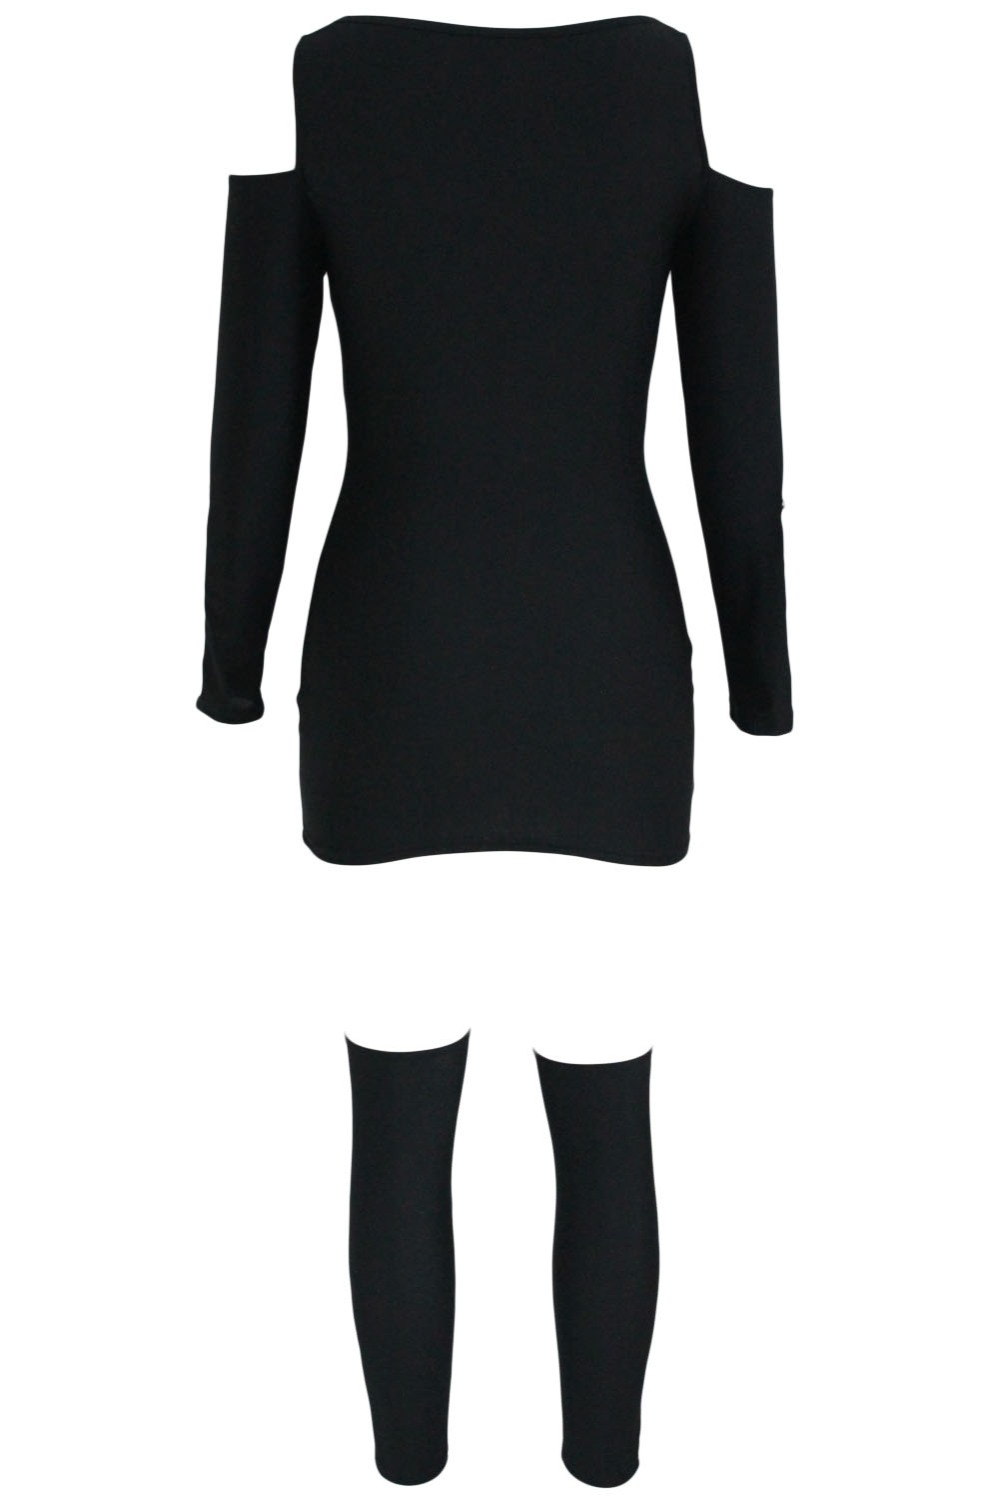 X-rayed-Halloween-Off-shoulder-Skeleton-Dress-Costume-LC89025-2-3